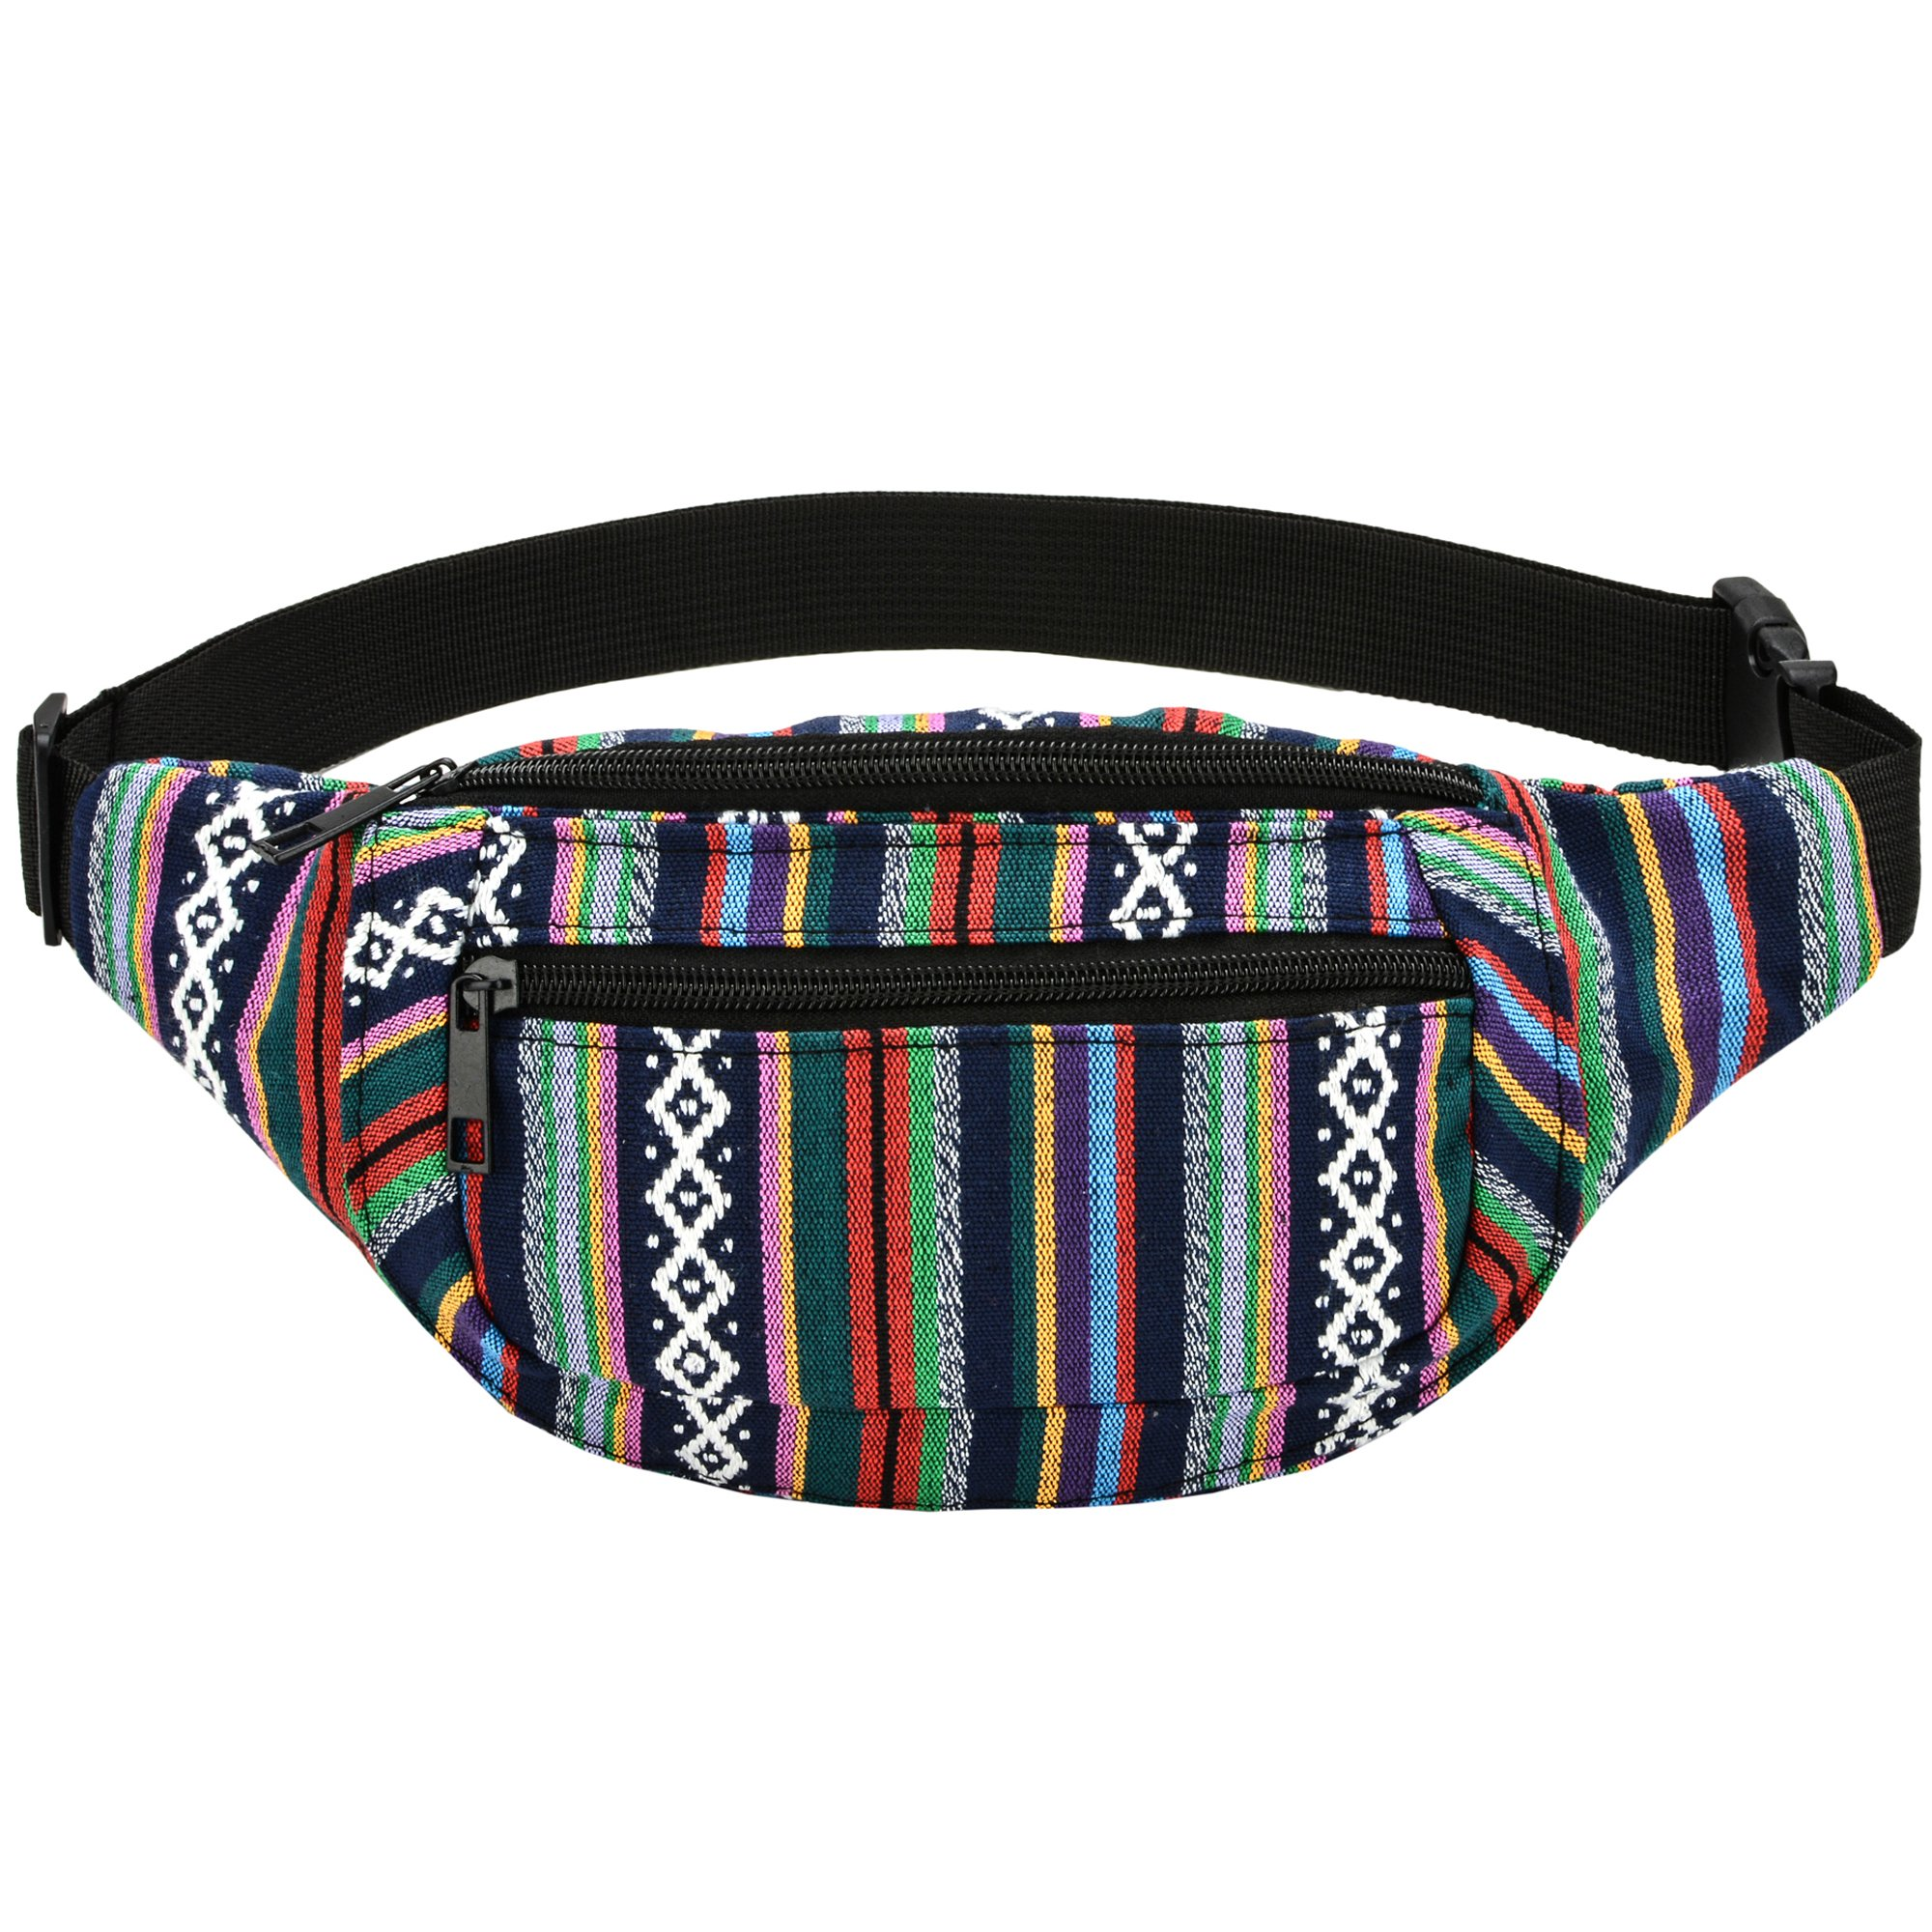 Kayhoma Boho Fanny Pack Stripe Festival Rave Bum Bags Travel Hiking Waist Belt Purse